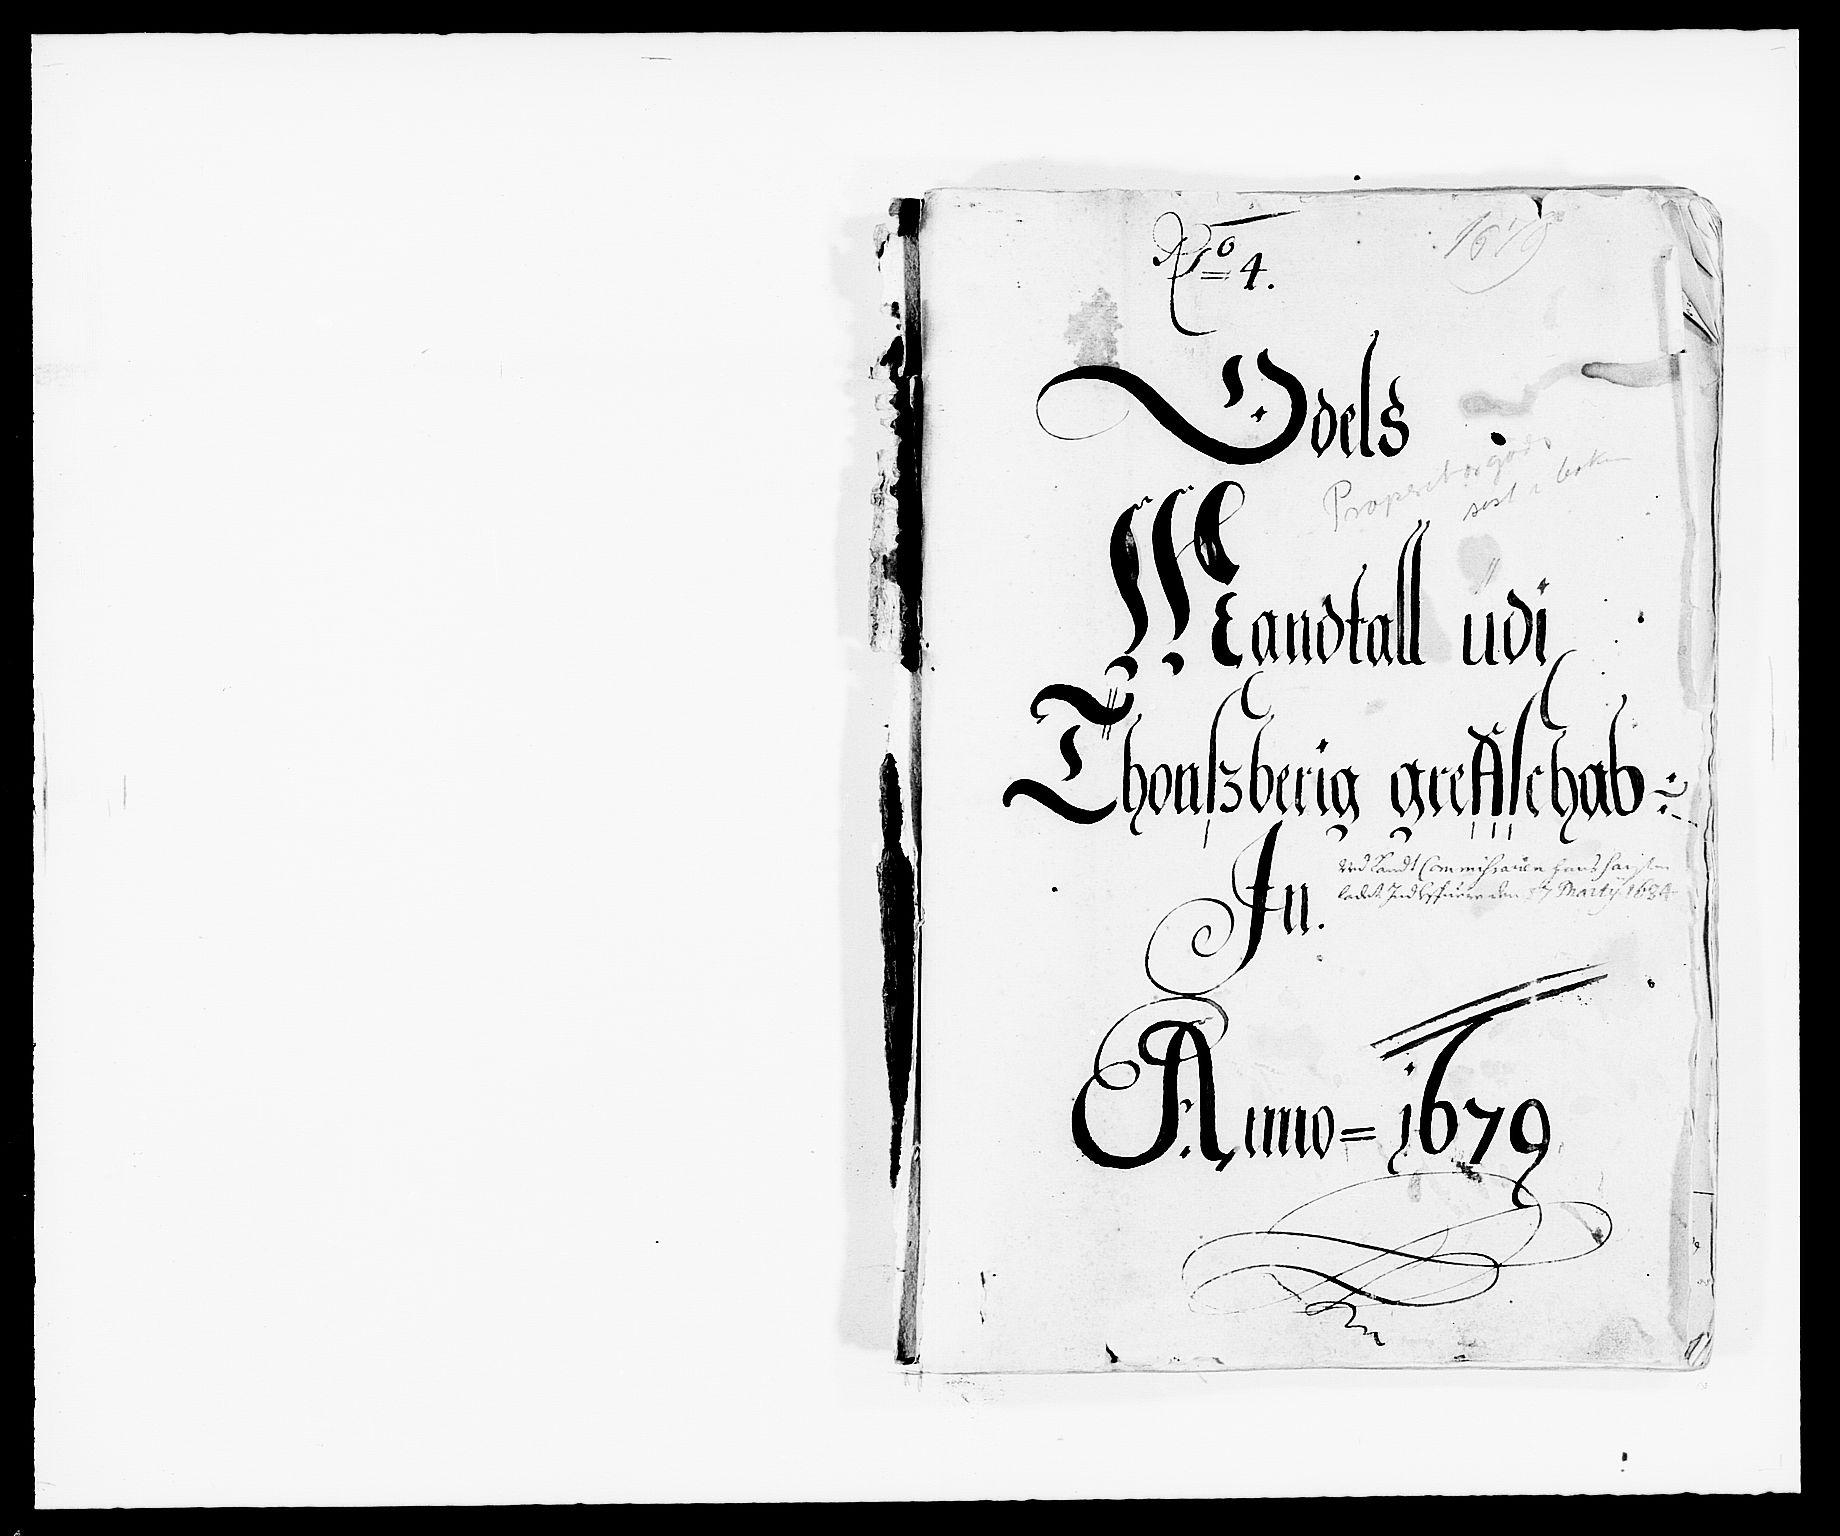 RA, Rentekammeret inntil 1814, Reviderte regnskaper, Fogderegnskap, R32/L1846: Fogderegnskap Jarlsberg grevskap, 1679-1680, s. 289